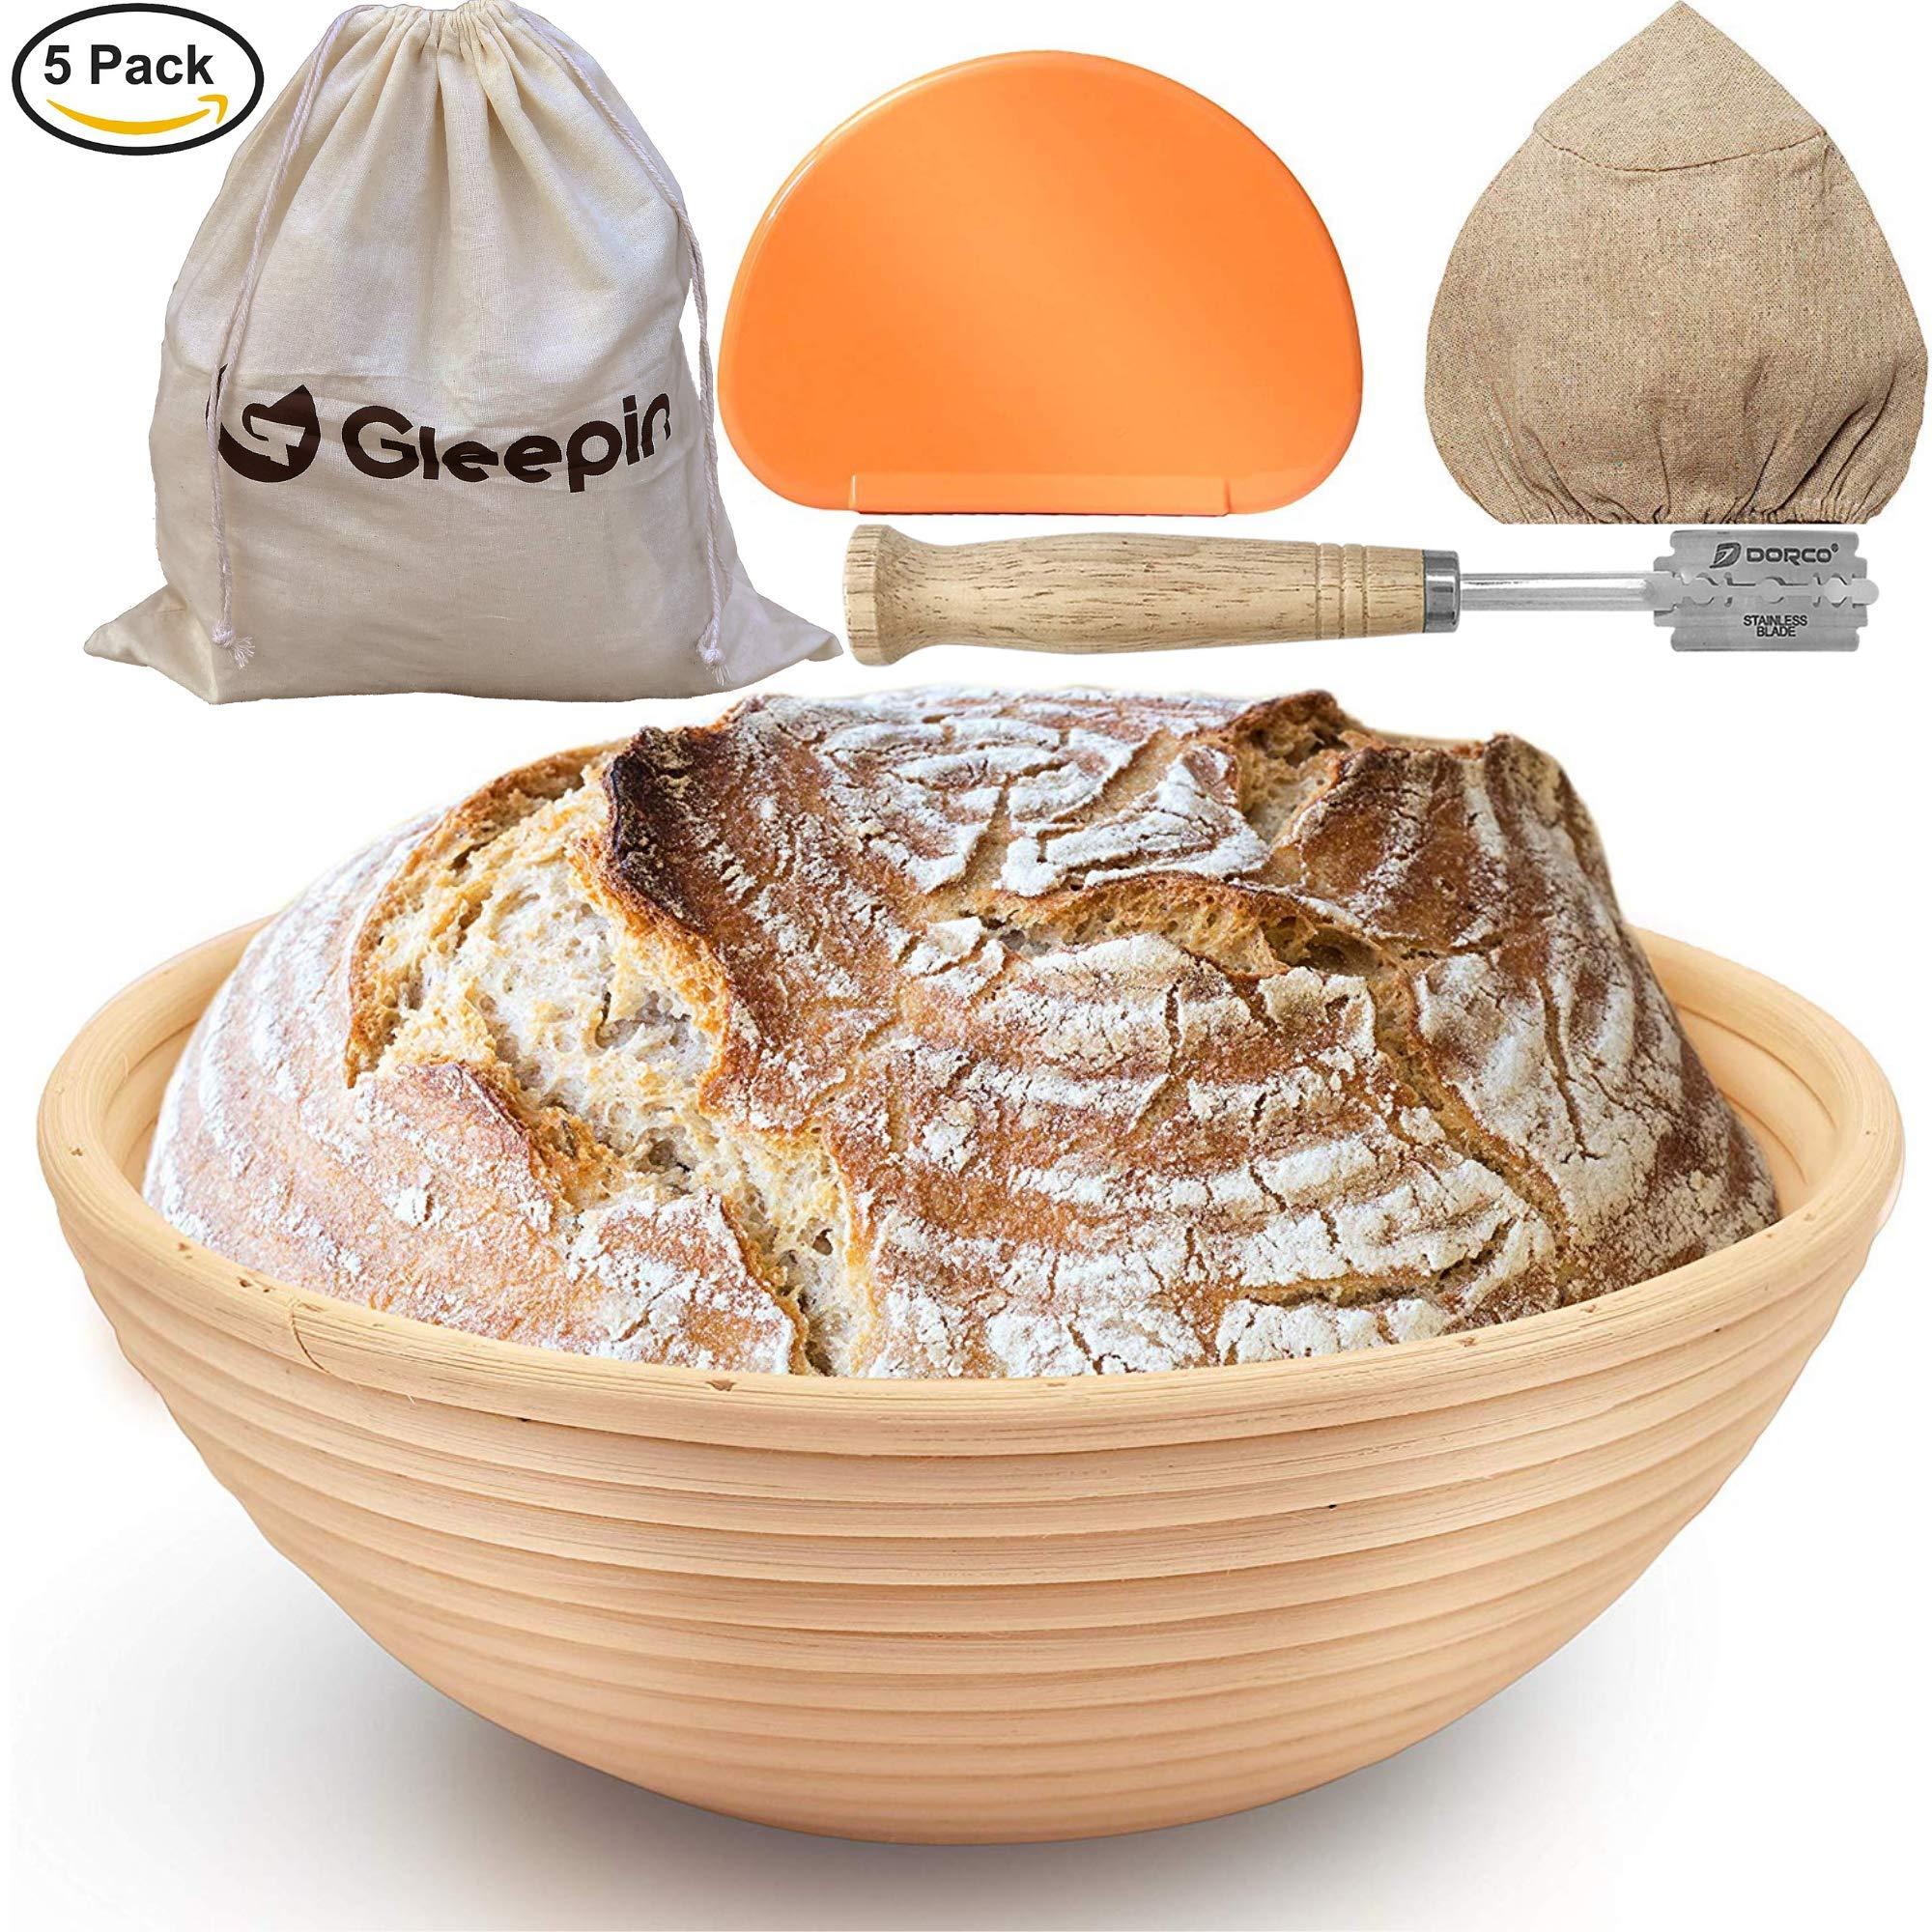 GLEEPIN SET: 9 Inch Round Banneton Proofing Basket Sourdough Bread Baking Tools, Rattan Handmade Bread Proofing Baskets & Bread Lame Dough Scoring Tool & Dough Scraper & Linen Liner Cloth &Bread Bags by Gleepin